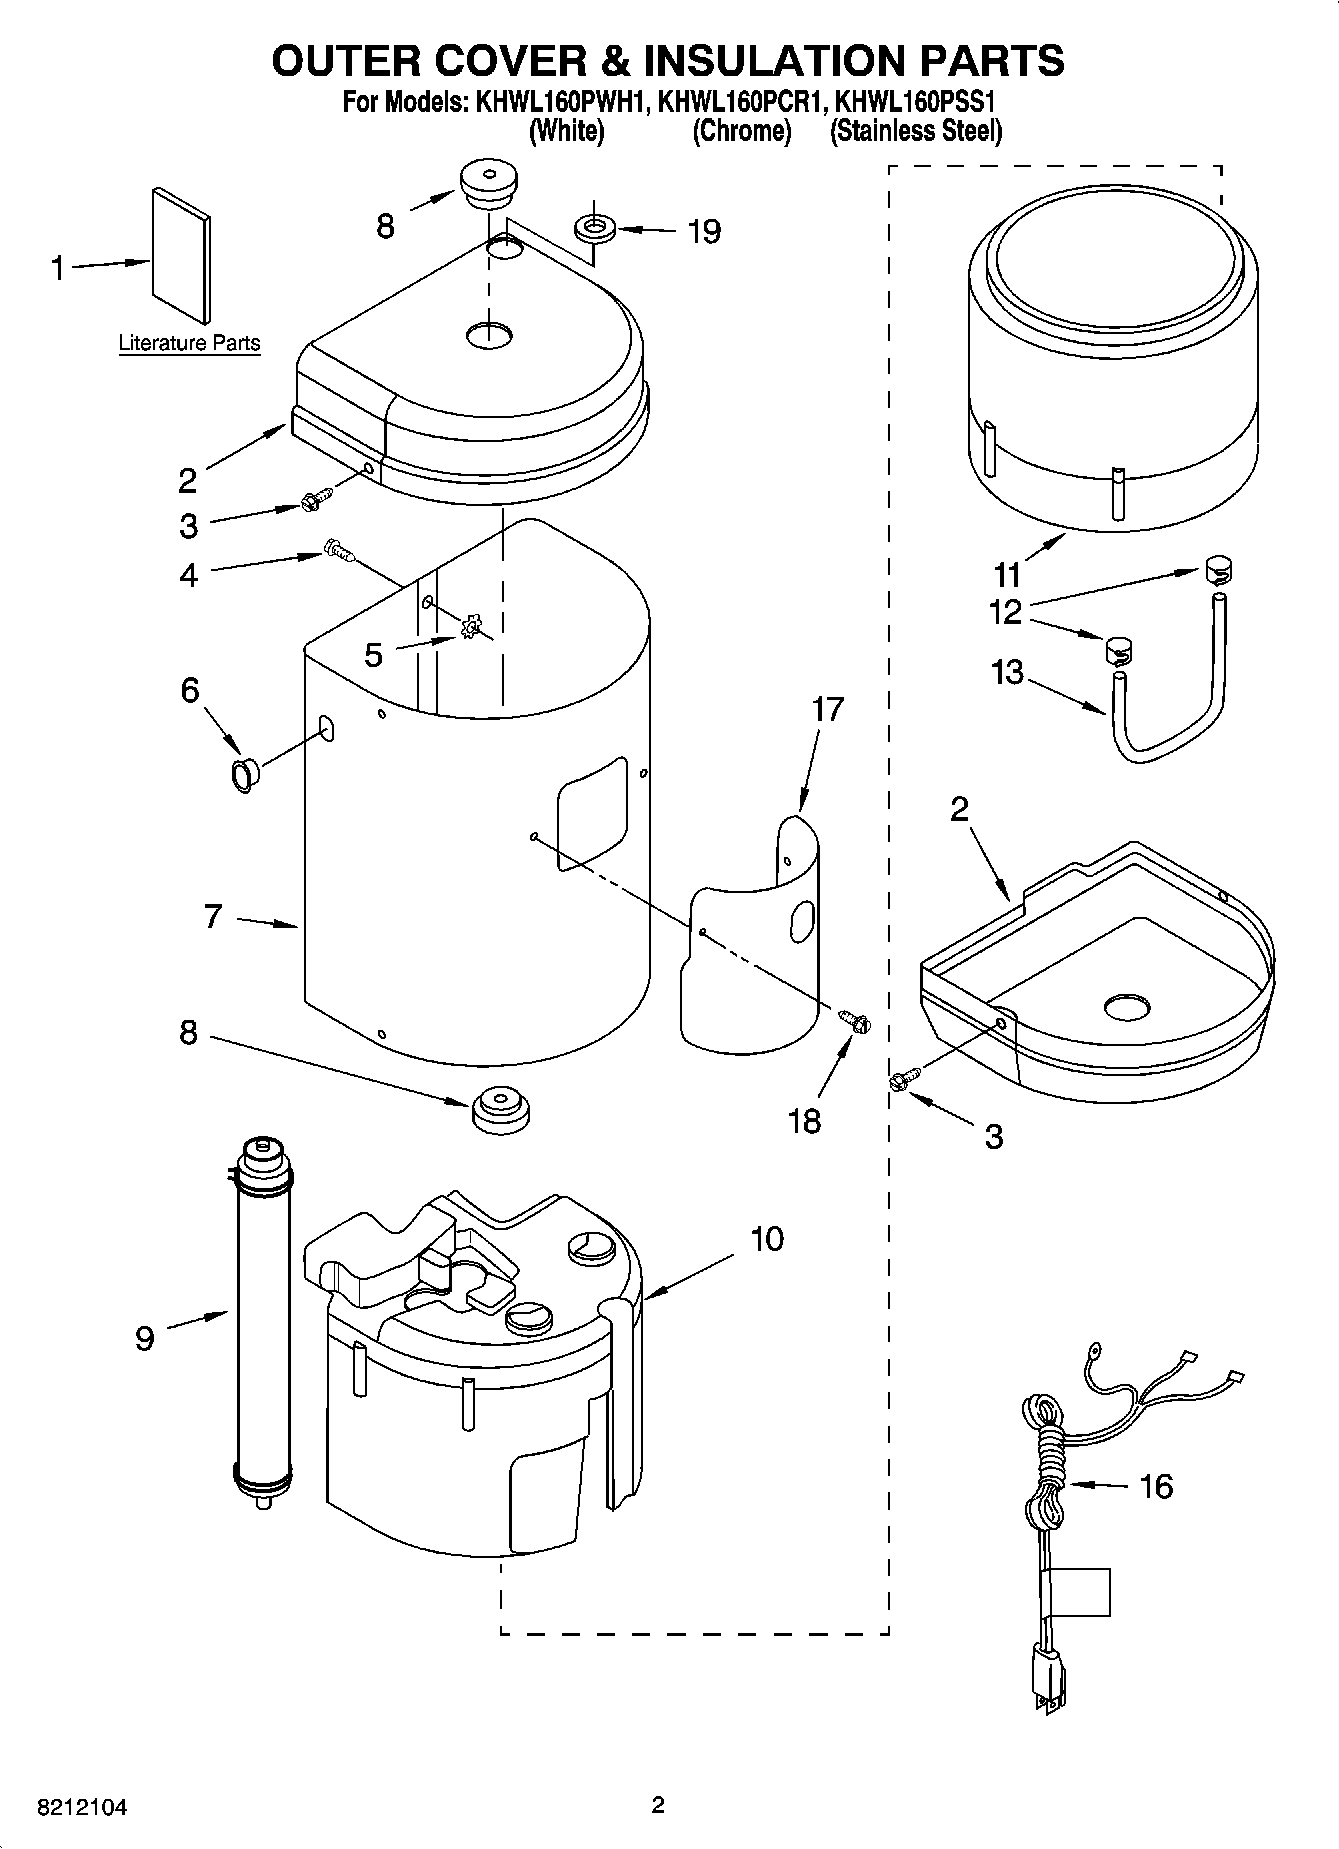 KHWL160PCR1